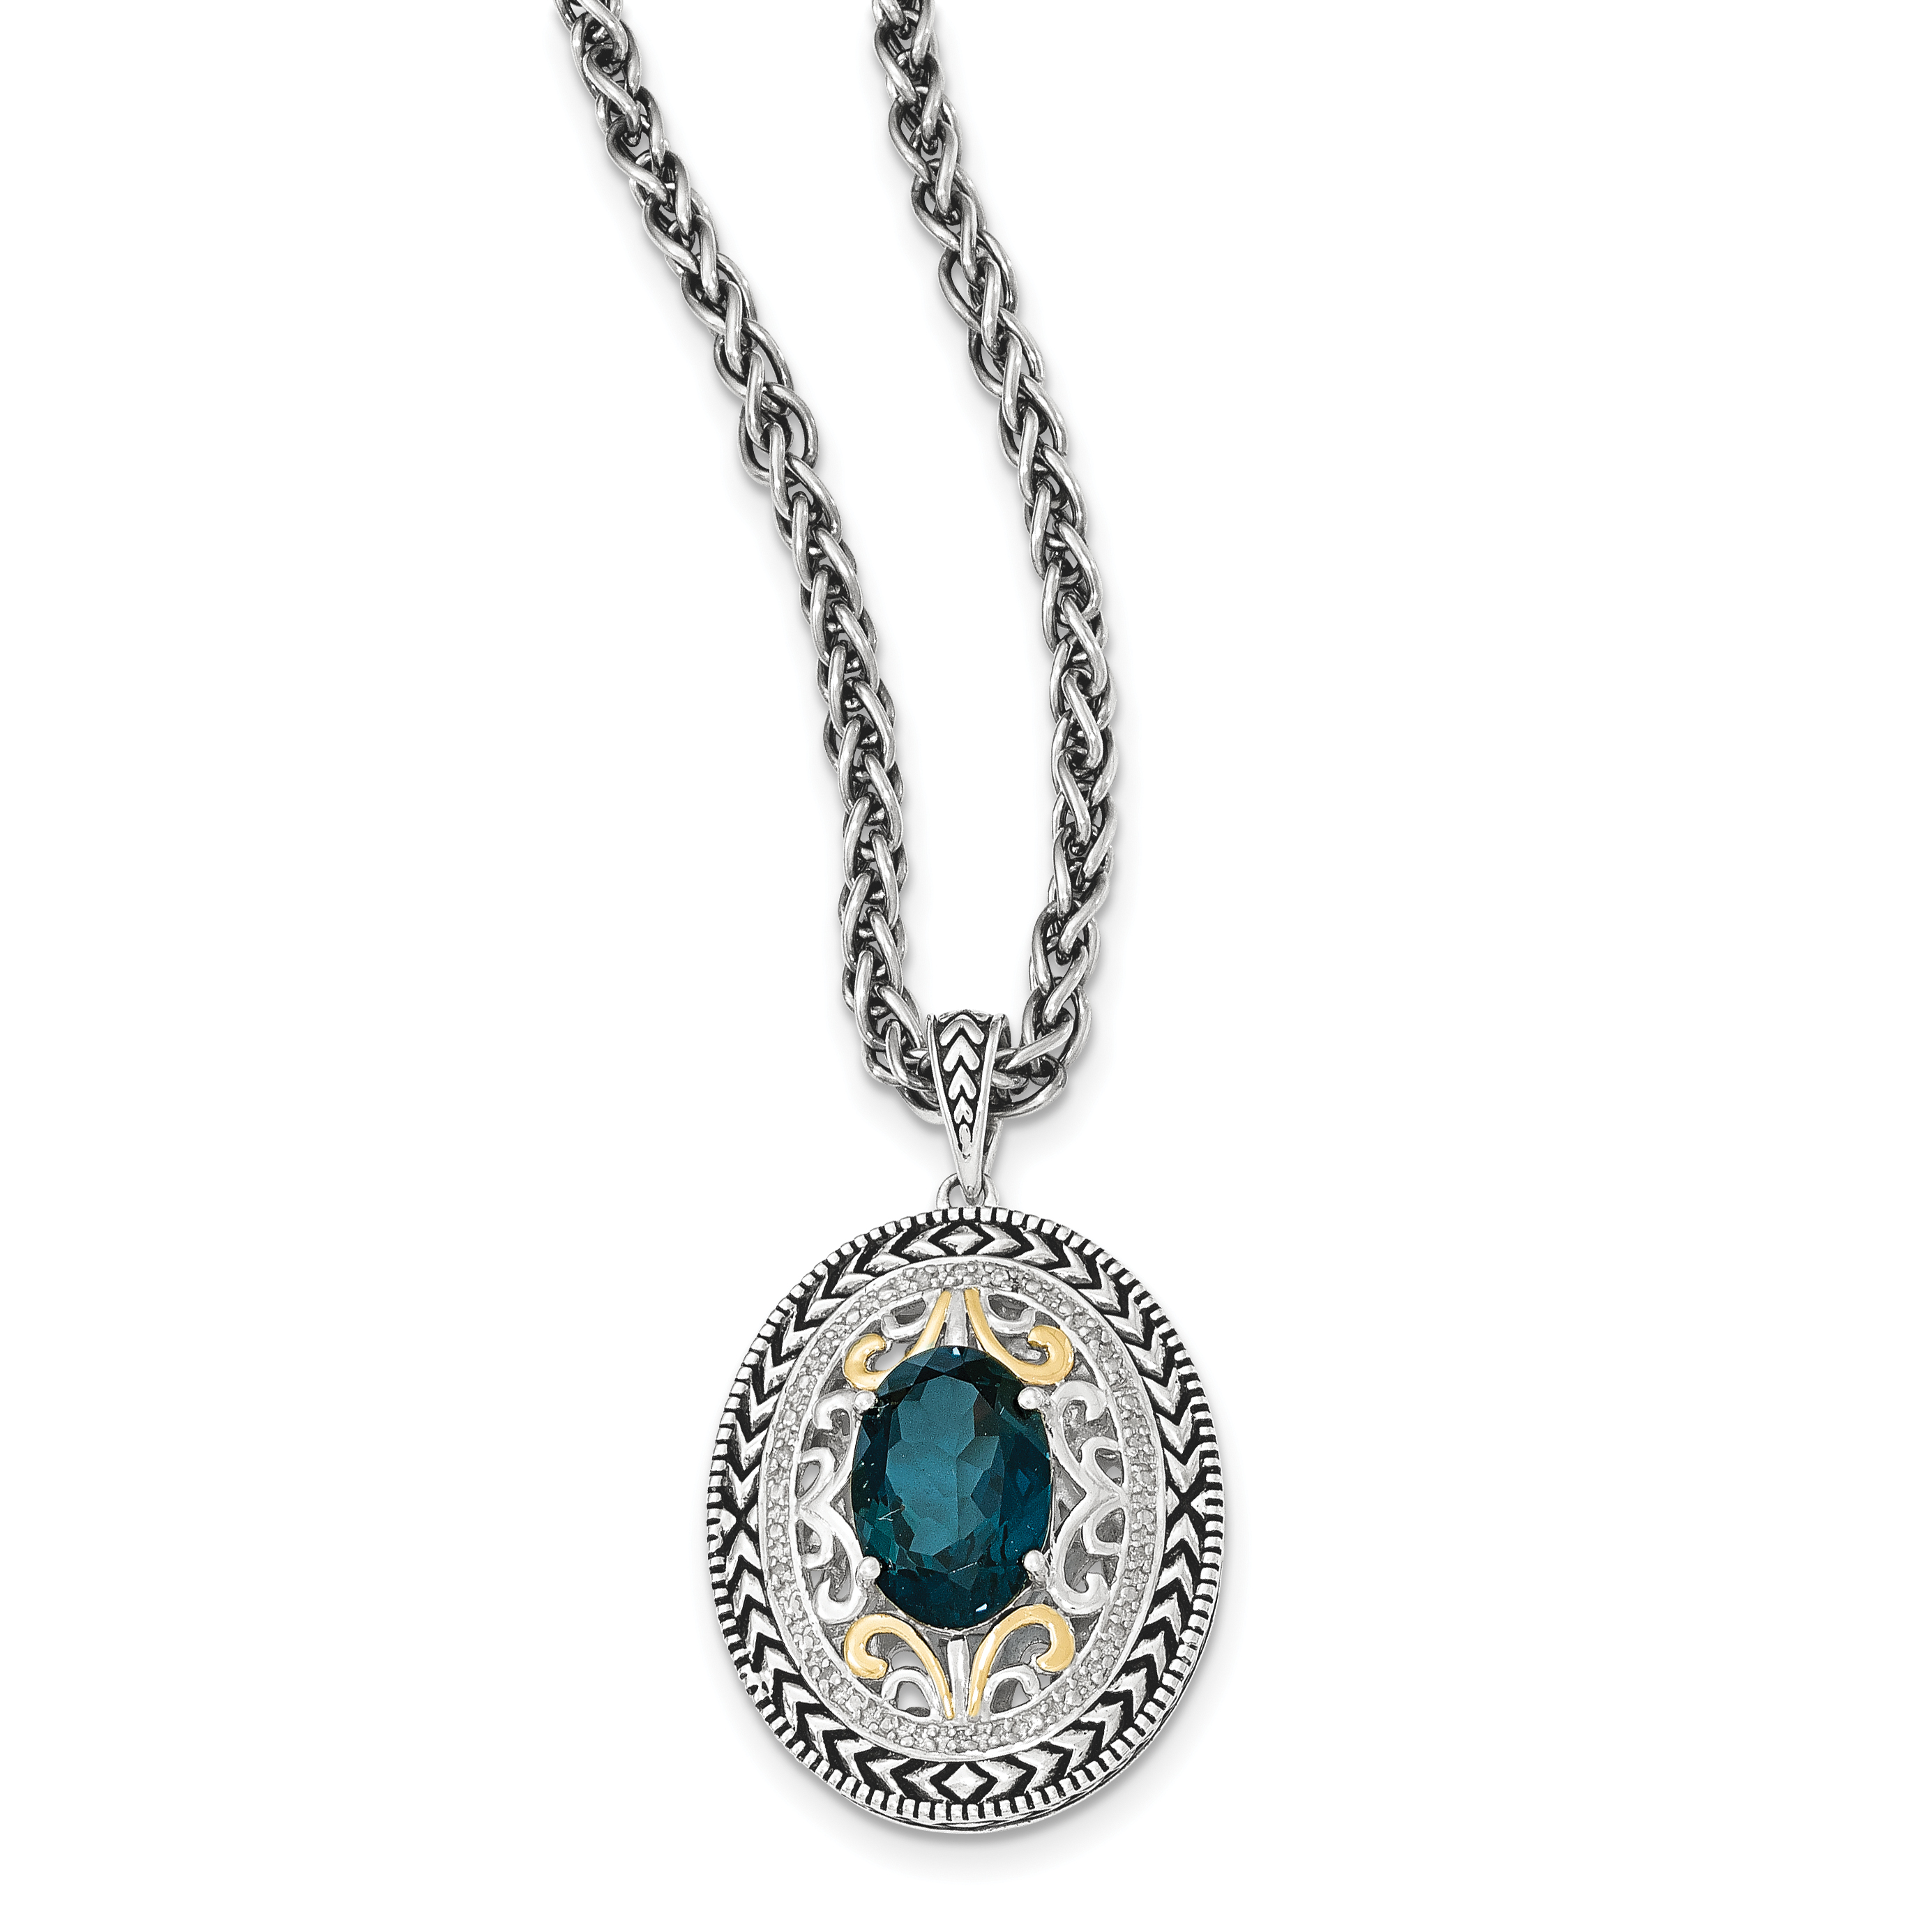 14k  Silver Two-Tone w  London Blue Topaz Necklace by